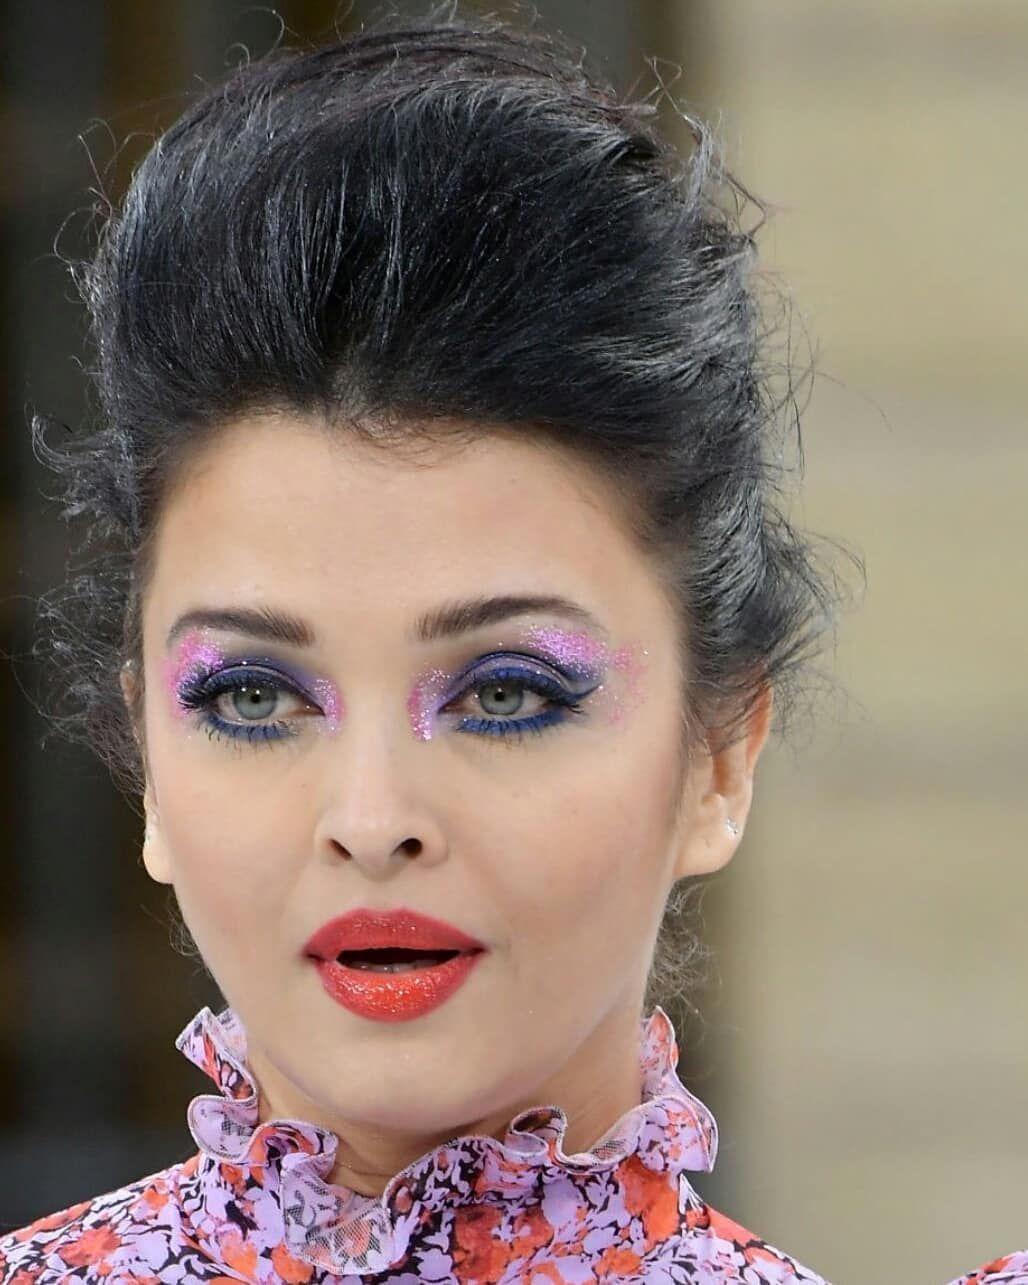 Aishwarya Rai On Instagram Q U E E N Aishwaryainparis Aishwarya Aishwaryarai Aishwarya Aishwarya Rai Makeup Aishwarya Rai Fashion Makeup